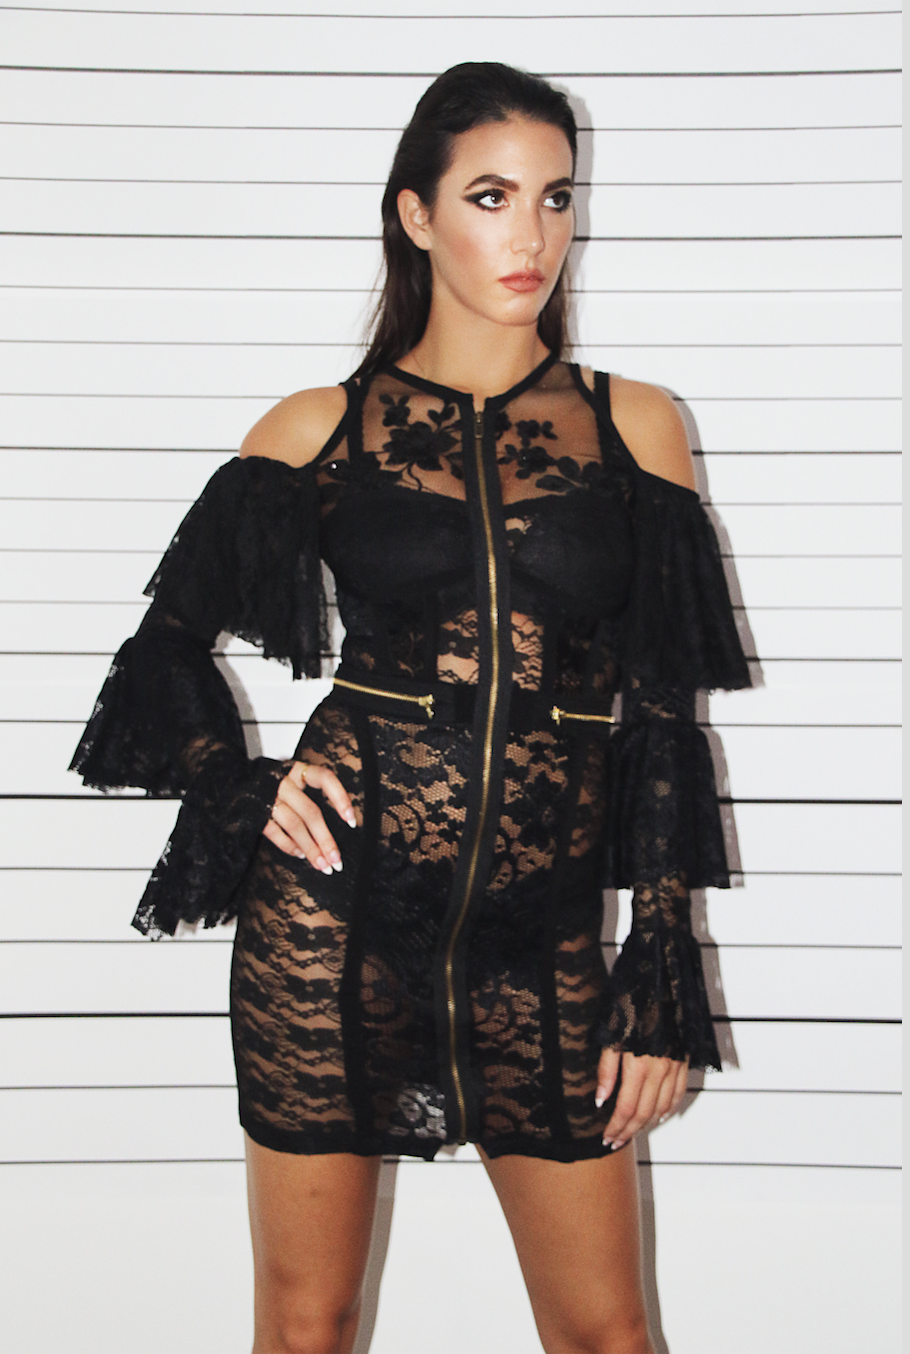 Image of Lace Zip Dress